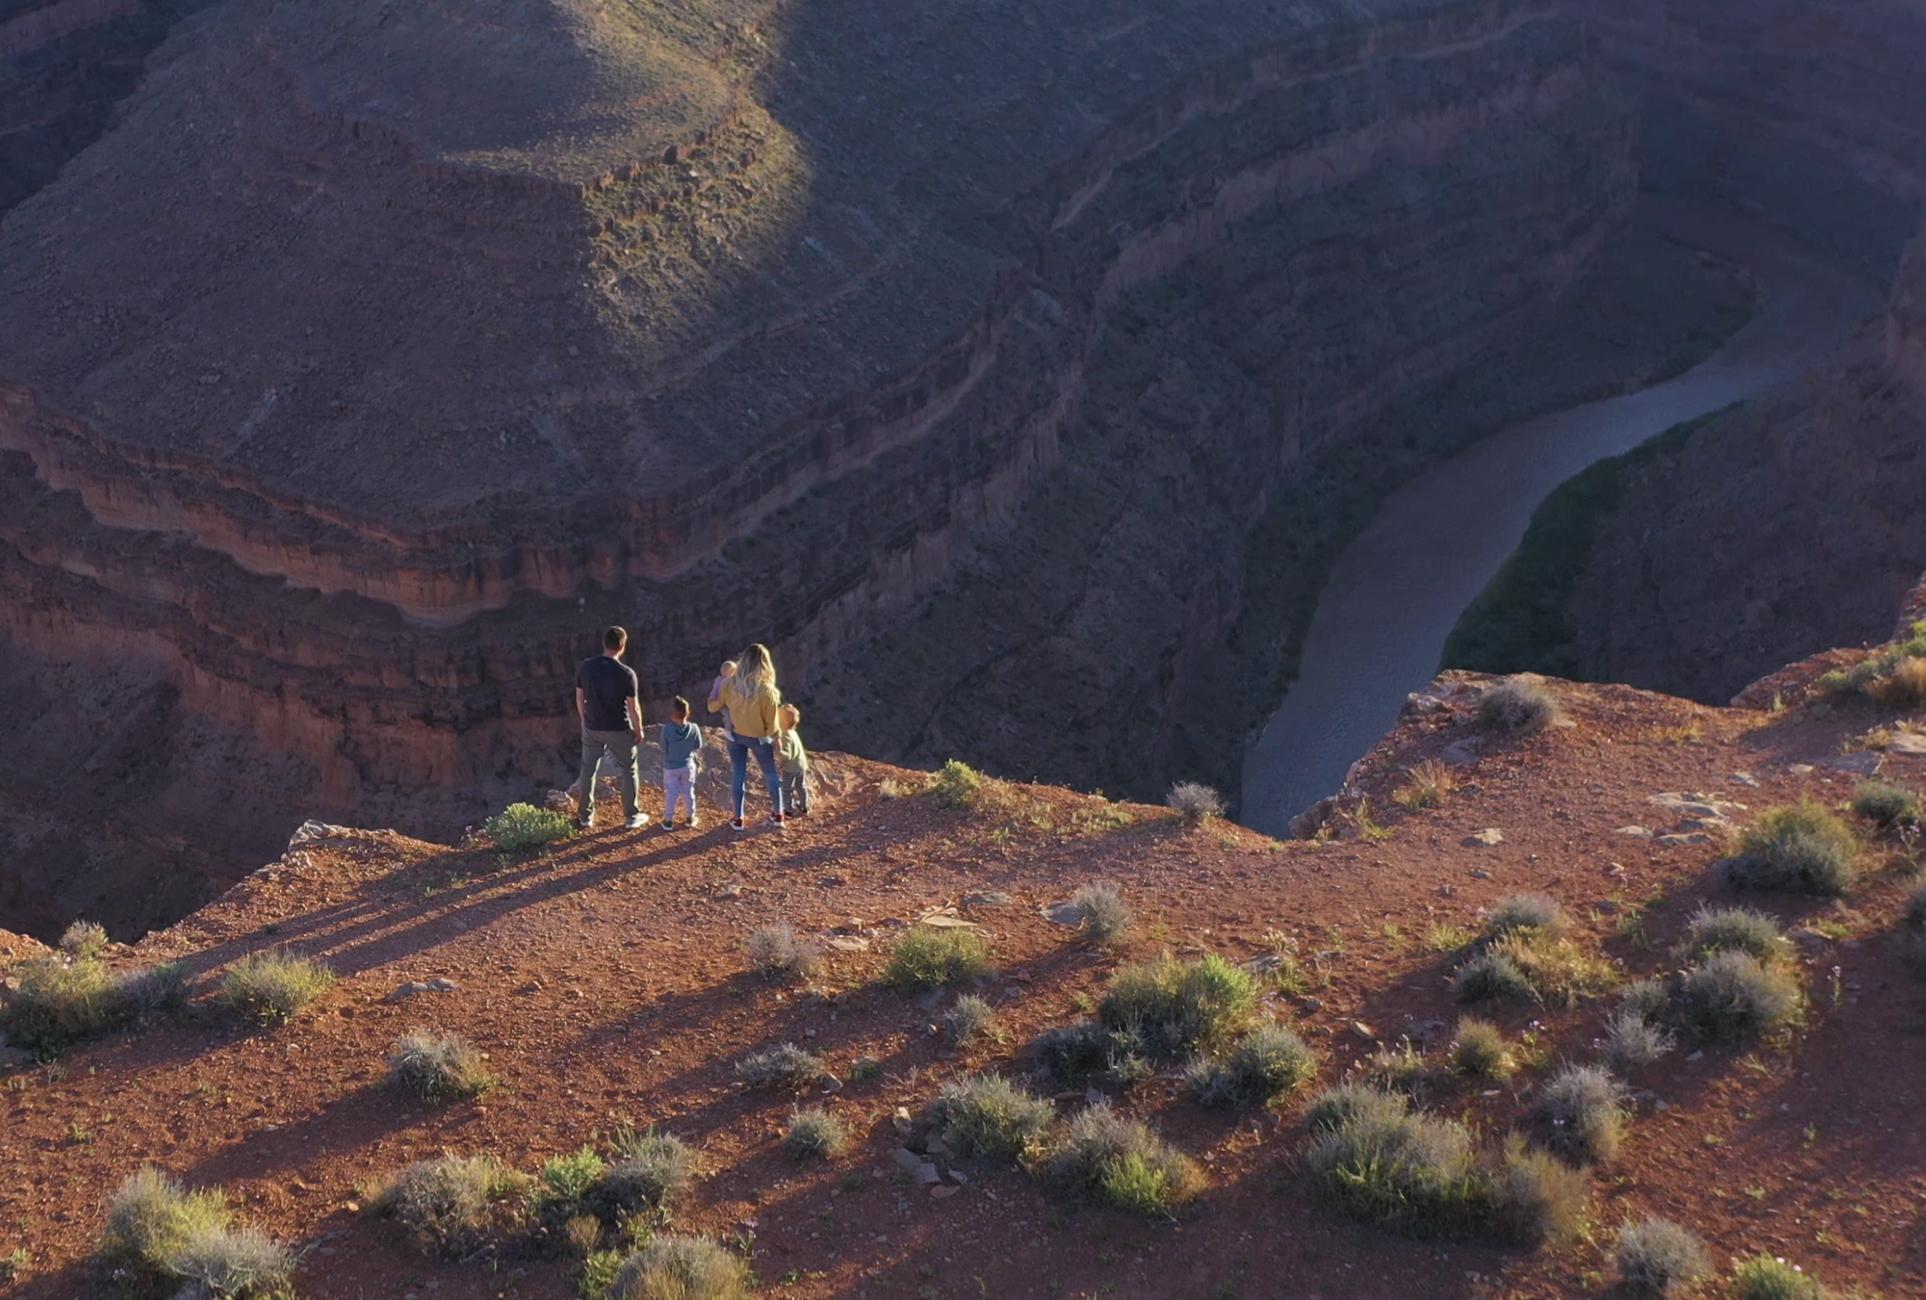 San Juan County Tourism & UT State Parks